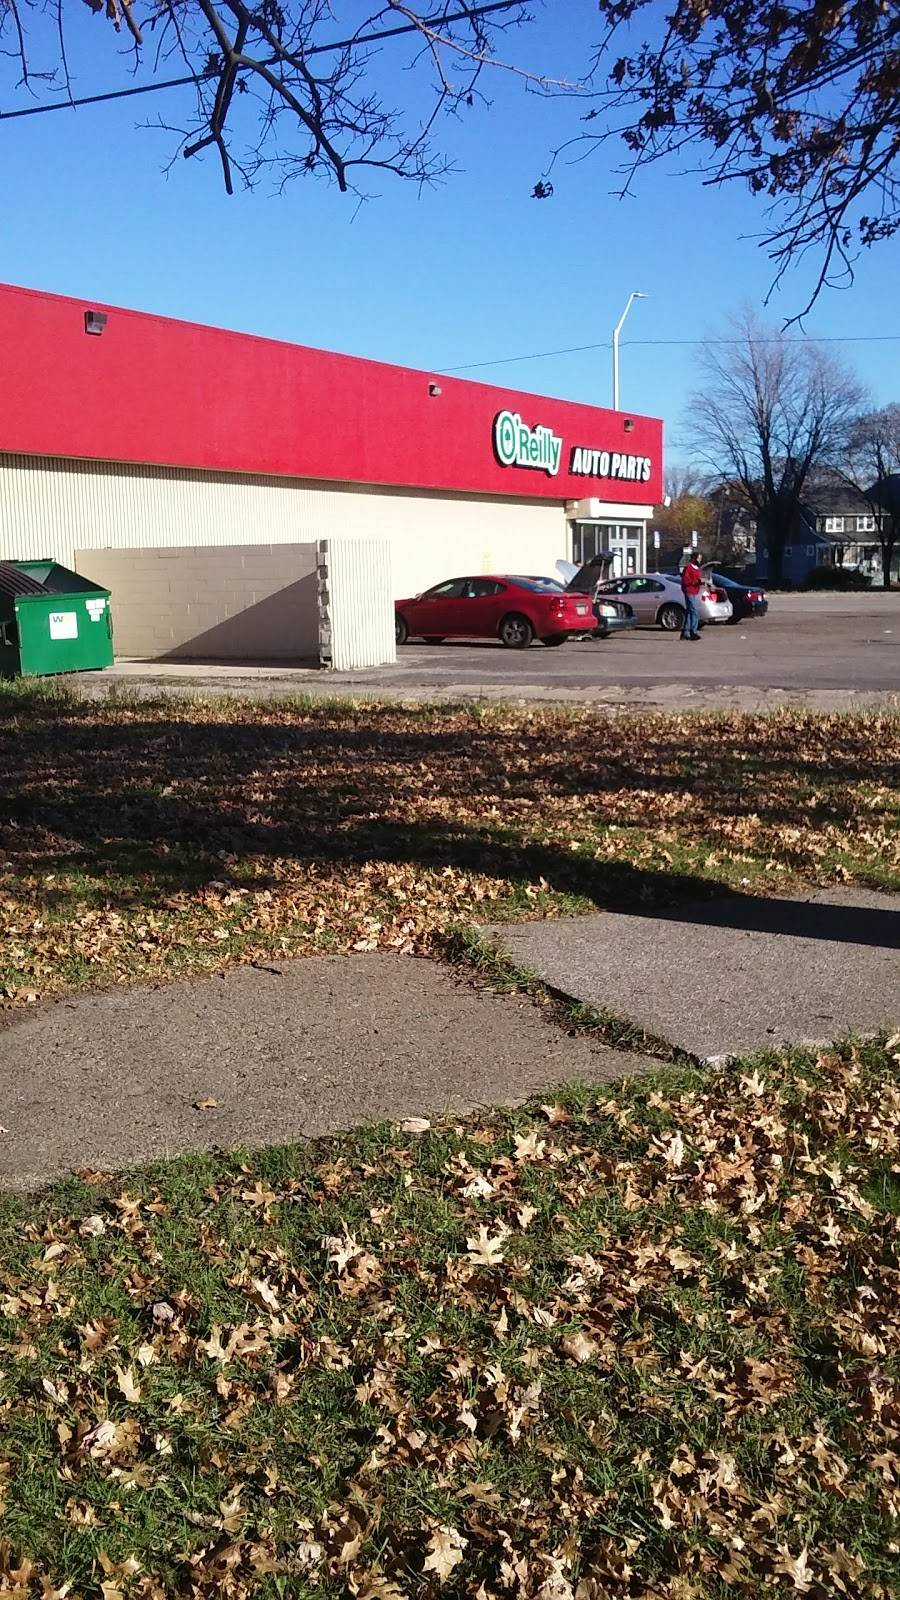 OReilly Auto Parts - electronics store  | Photo 1 of 10 | Address: 7737 Gratiot Ave, Detroit, MI 48213, USA | Phone: (313) 921-1000